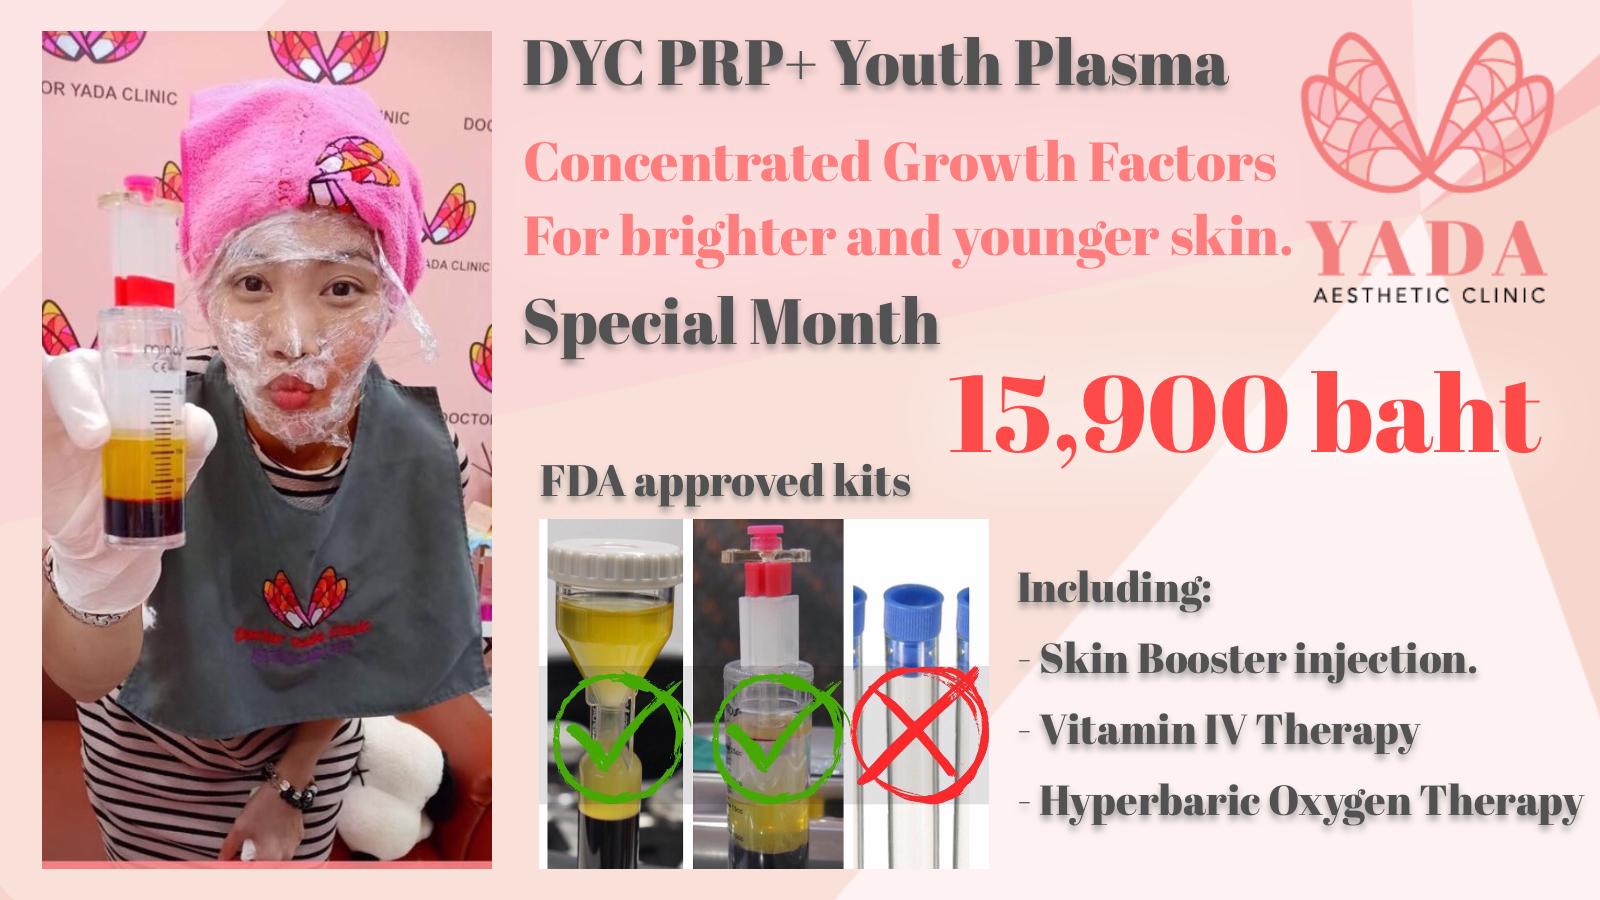 DYC PRP+ Youth Plasma at Doctor Yada Clinic, Pattaya